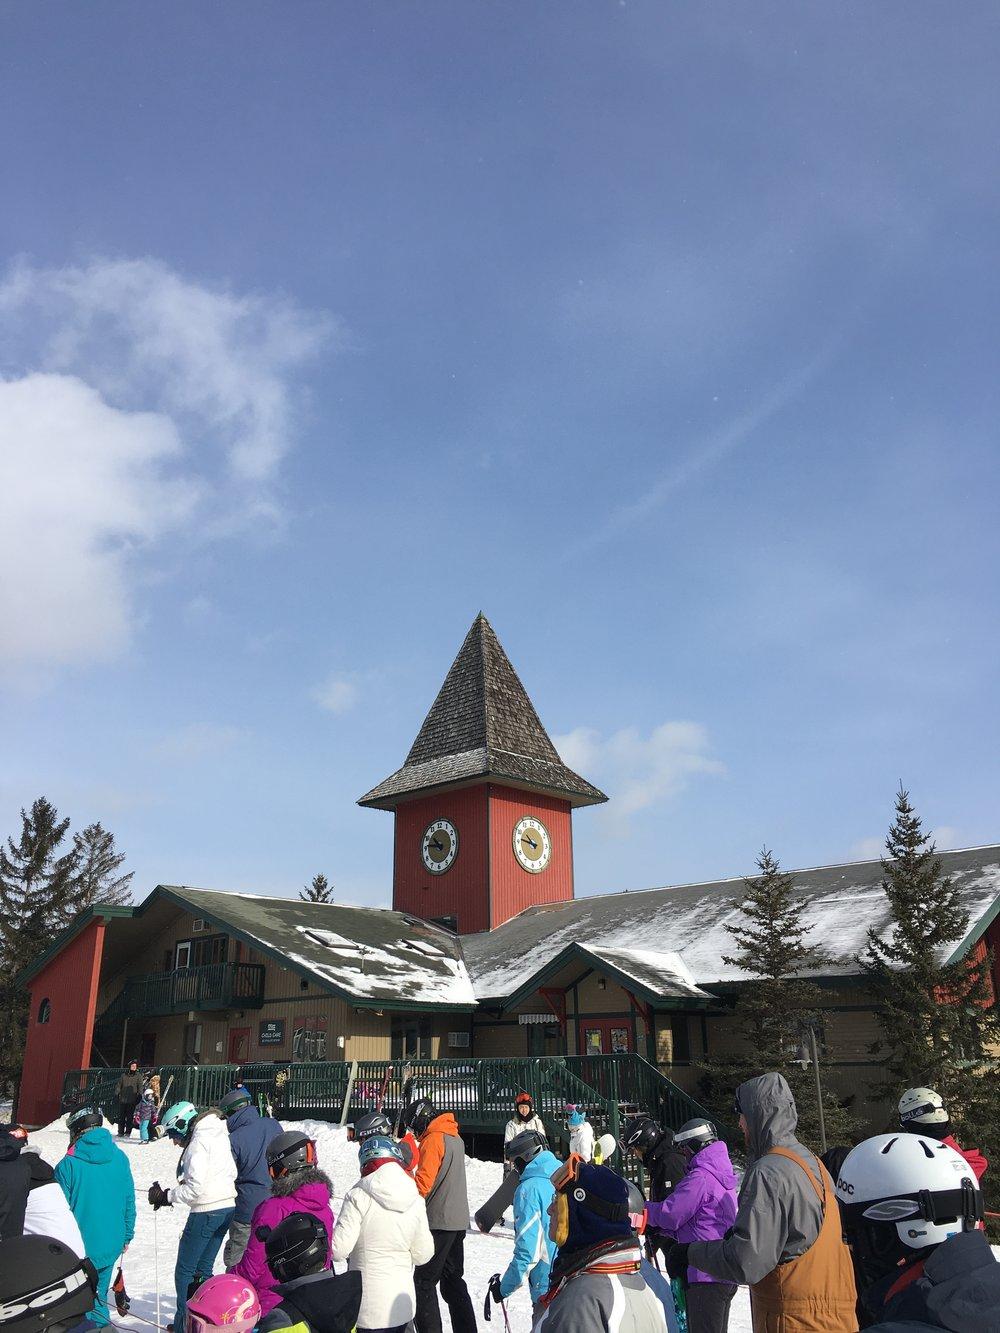 The main village at Mount Snow.